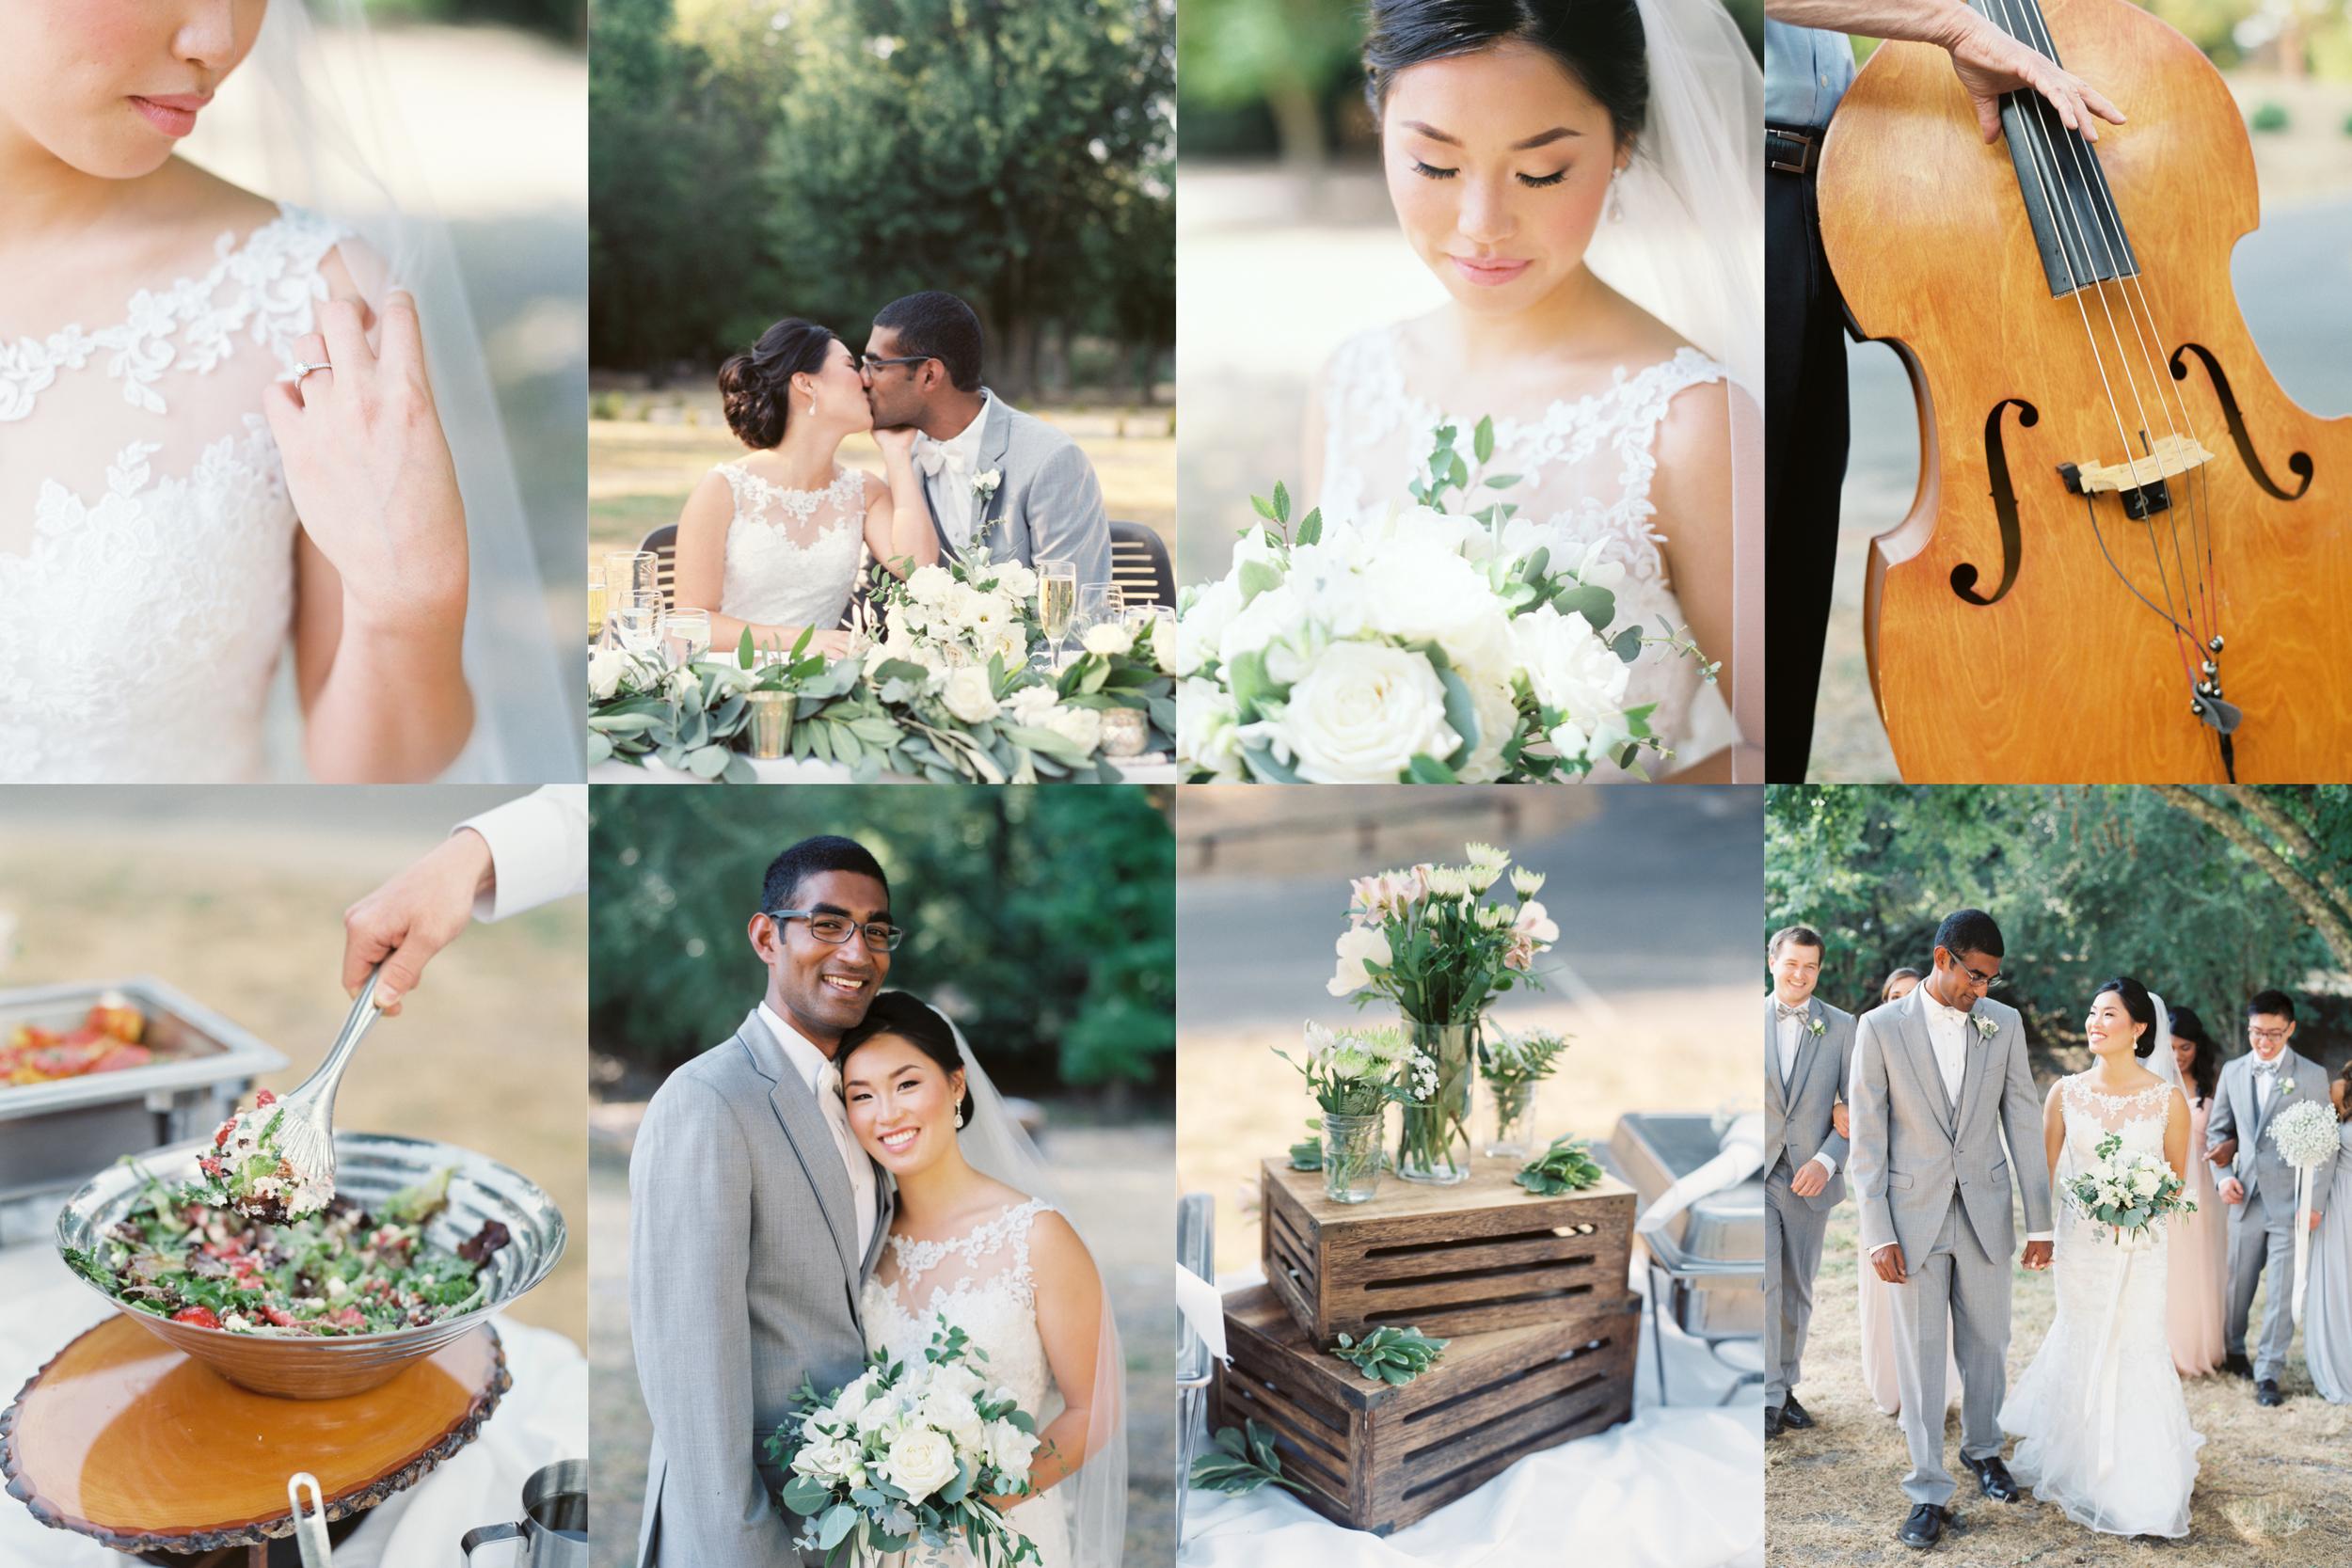 Meghan Mehan Photography - Fine Art Film Photography - San Francisco | Napa | Sonoma | Big Sur | Carmel | Santa Barbara - 2.jpg